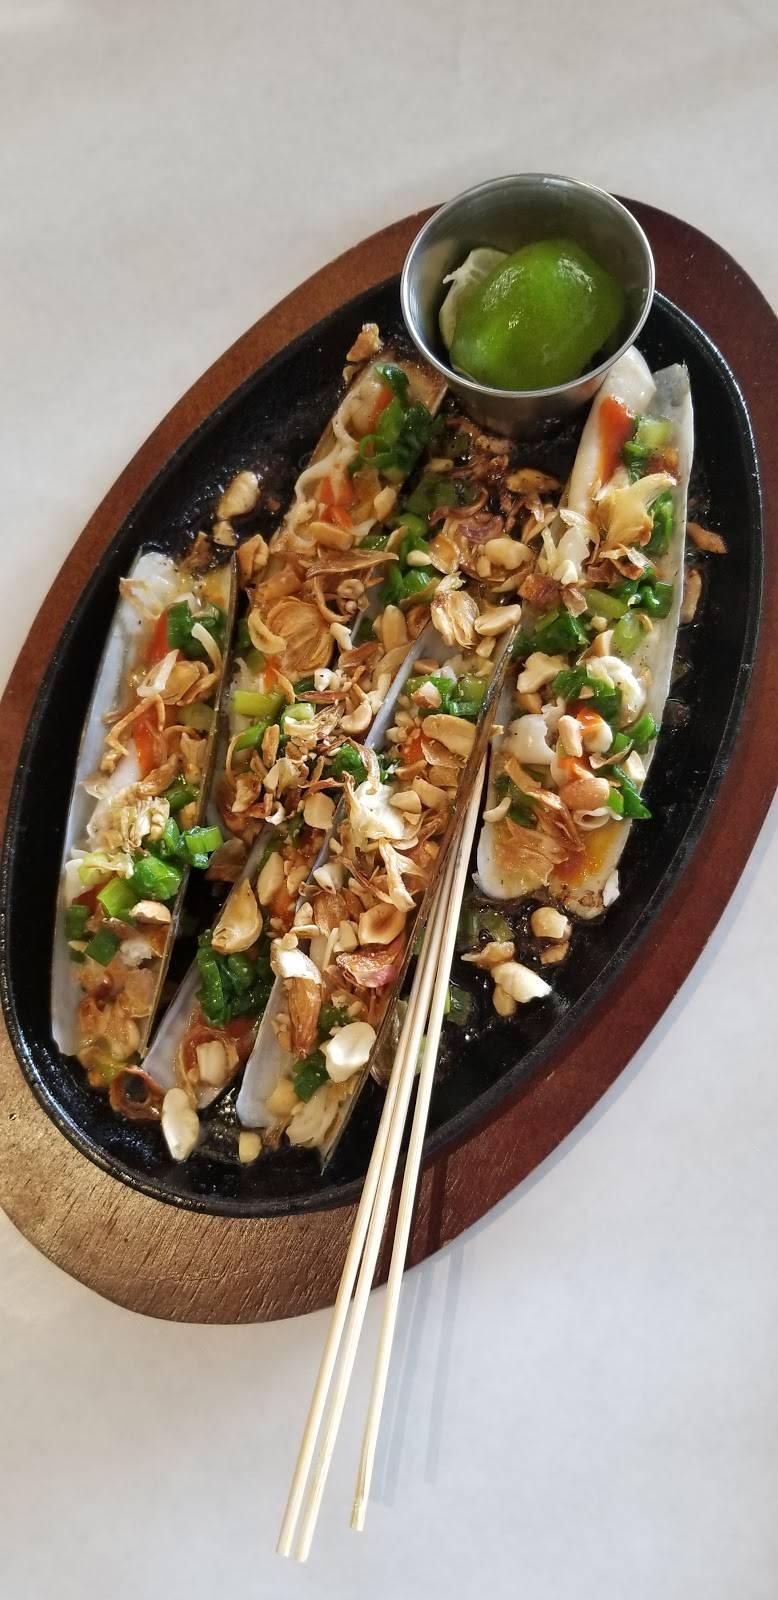 Destination Seafood House | restaurant | 15606 Brookhurst St, Westminster, CA 92683, USA | 7148844692 OR +1 714-884-4692